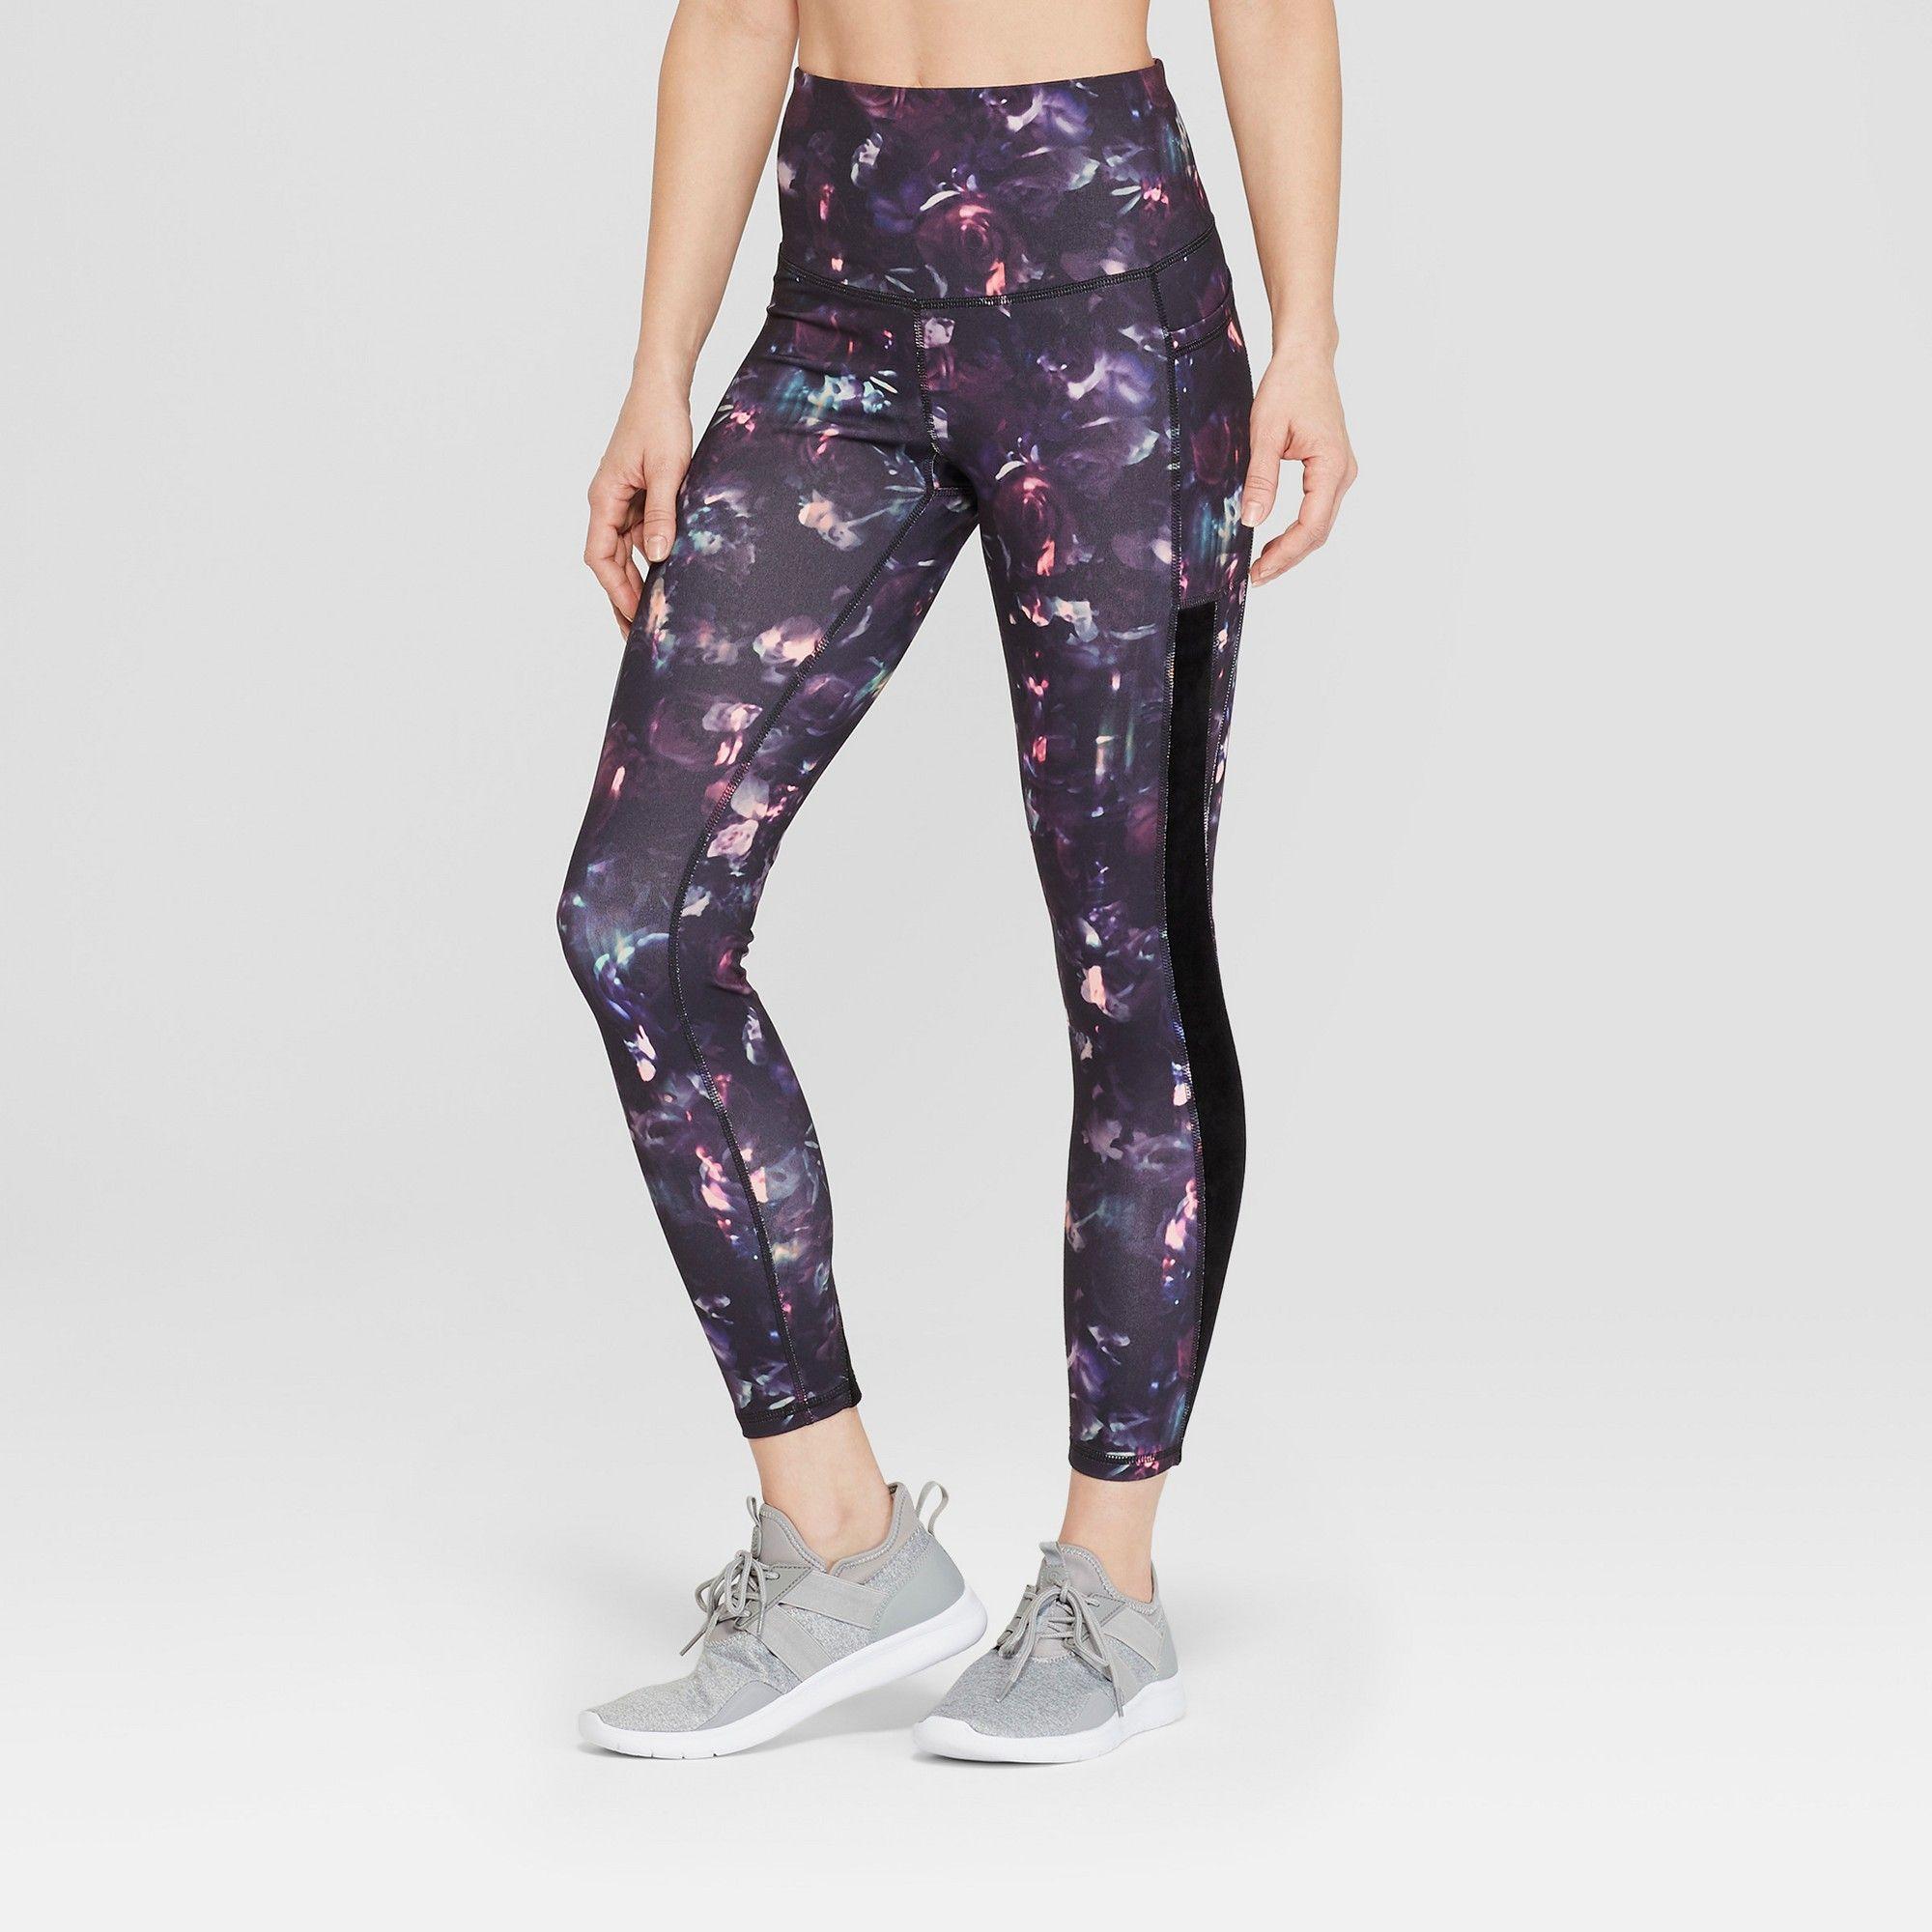 961b82728bbc45 Women's Floral Print Studio High-Waisted Leggings 25 - C9 Champion Black Xxl